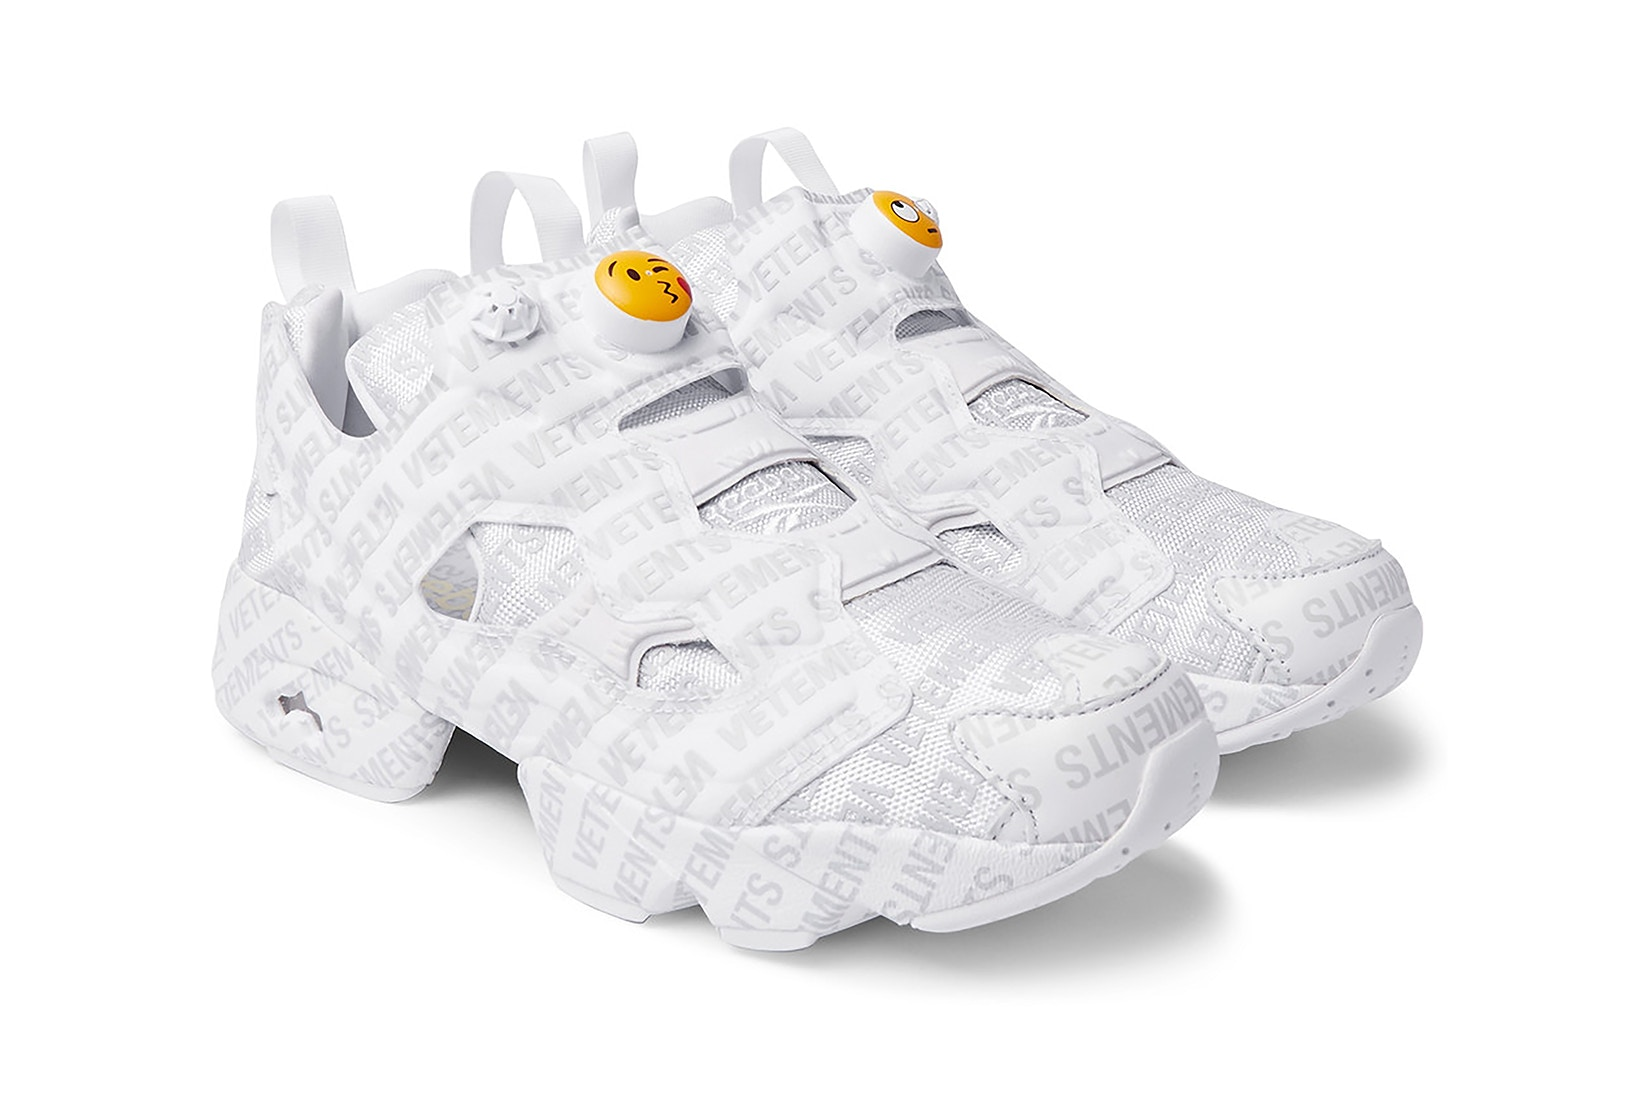 You Can Cop The Vetements x Reebok InstaPump Fury Emoji Sneakers Now